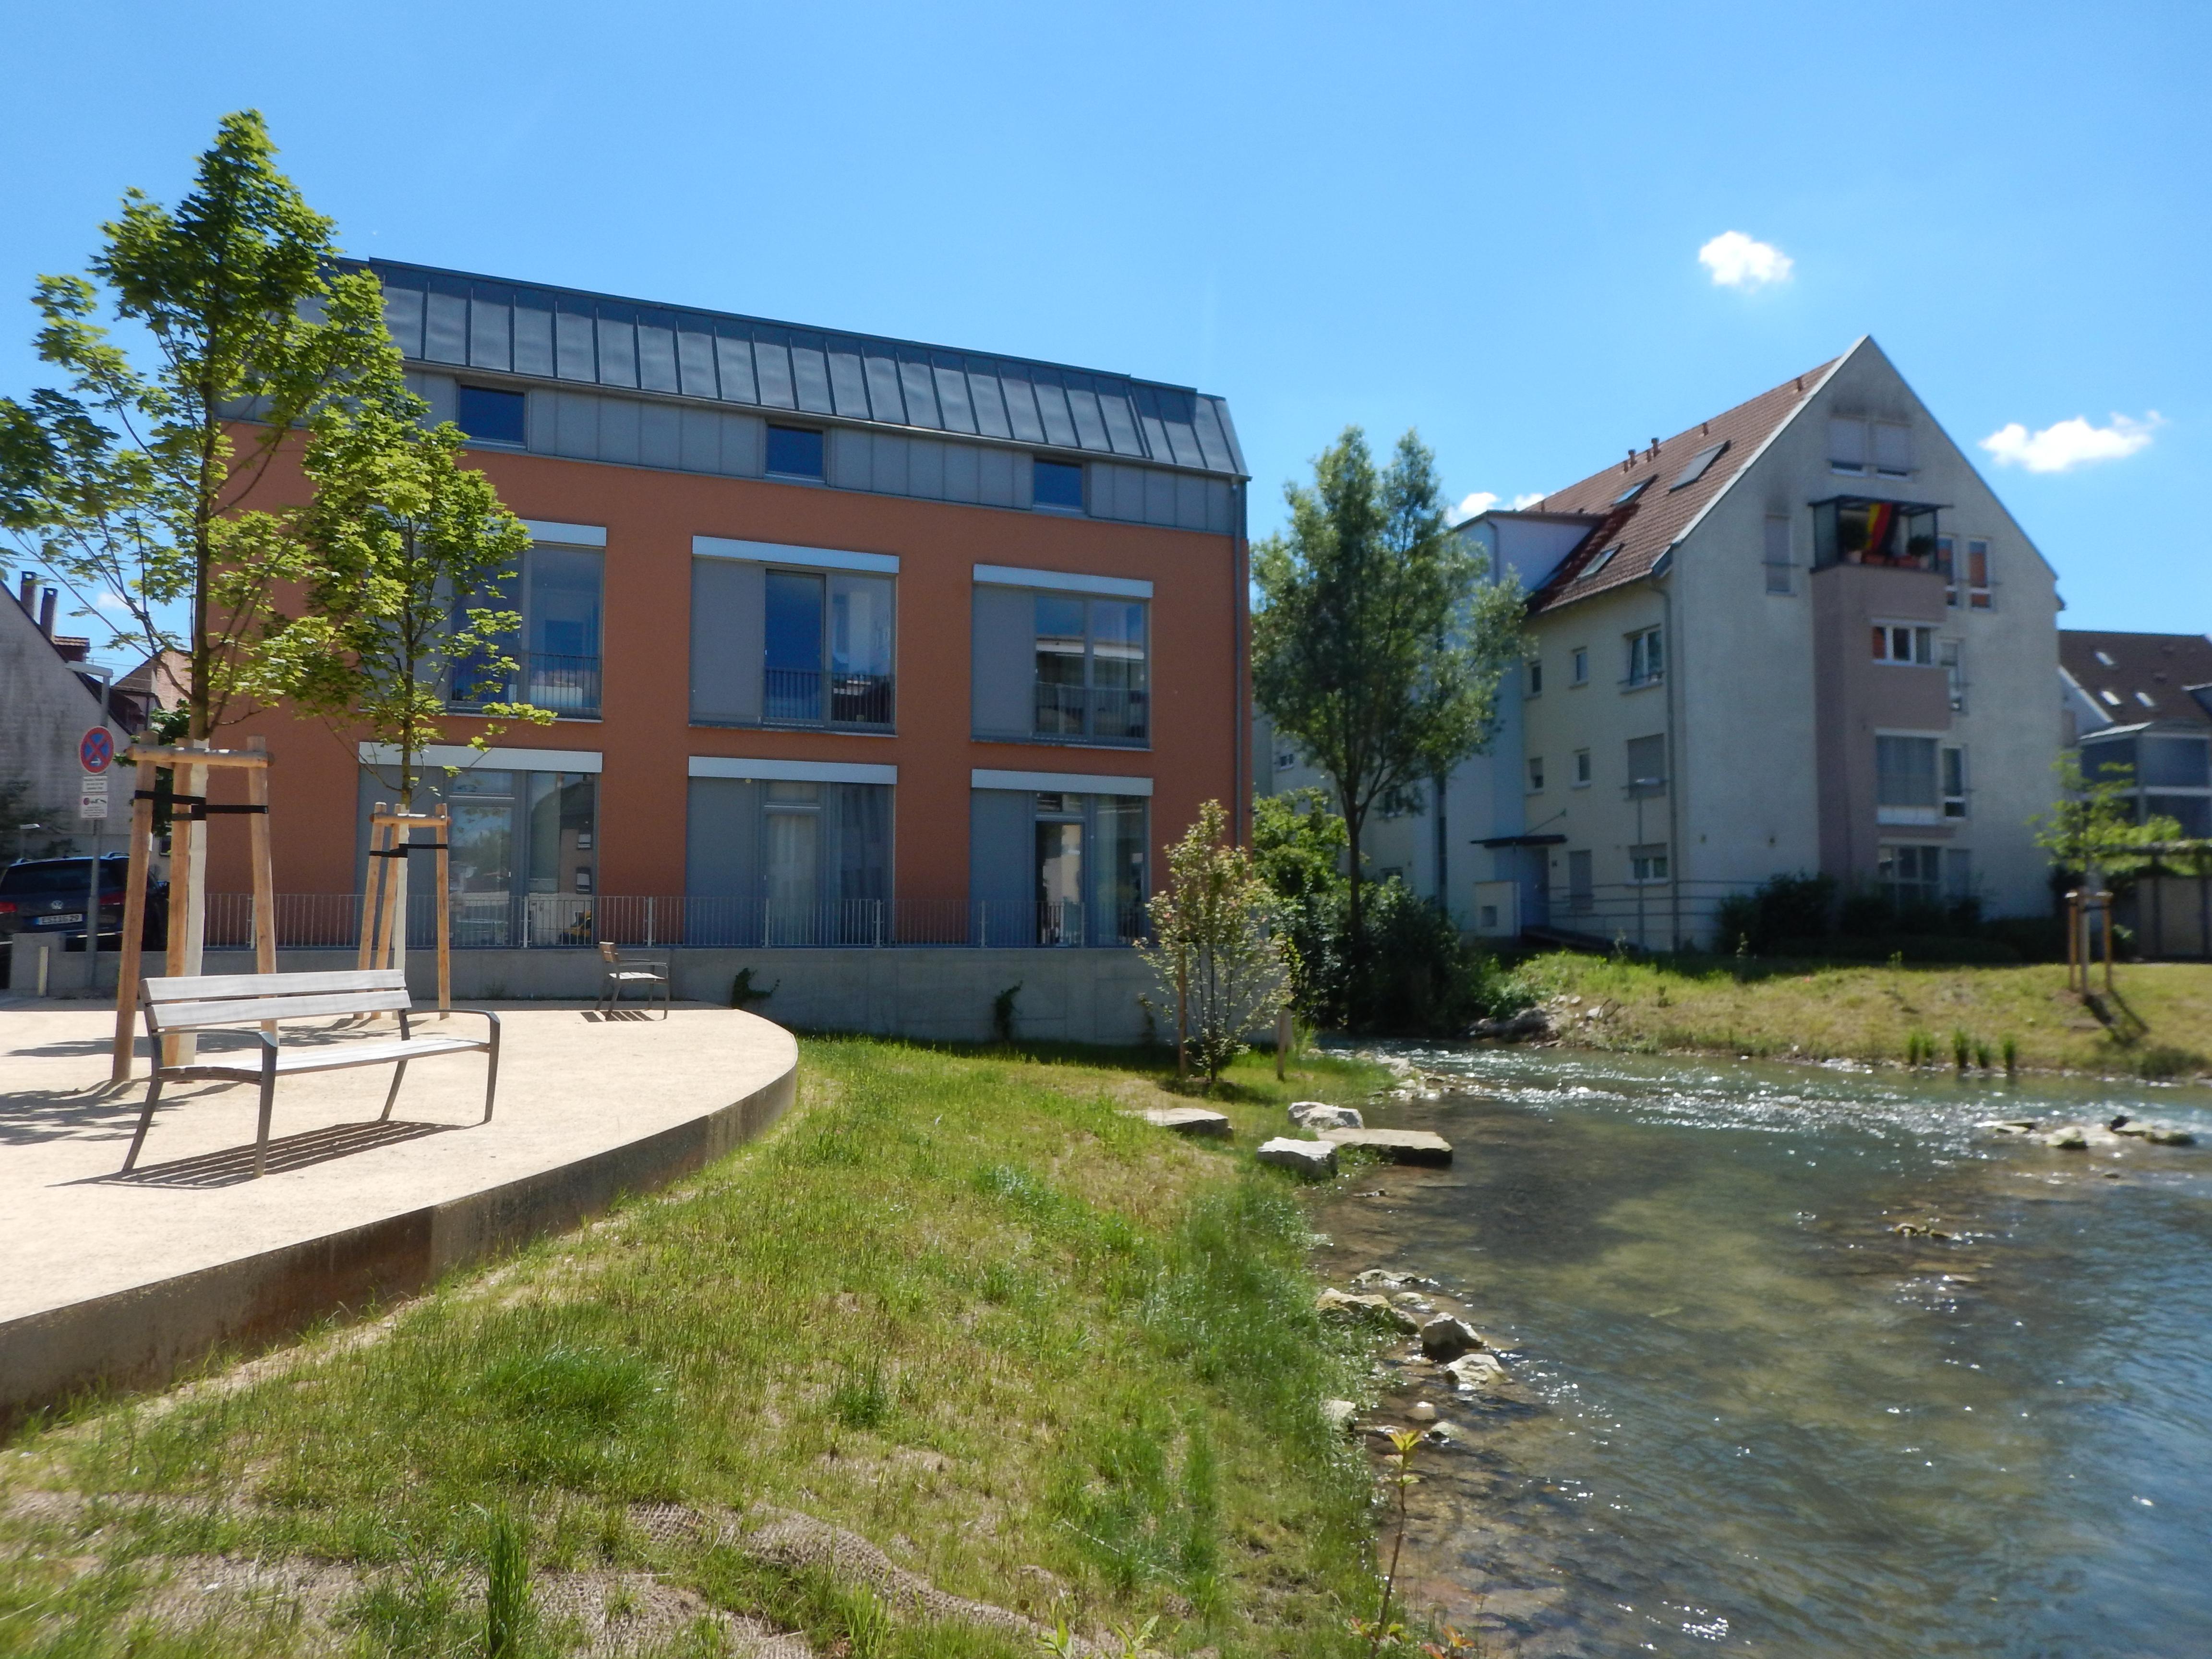 aquaburg-aquawand-ufer-wasserfläche-lauter-bach-kirchheim-unter-teck